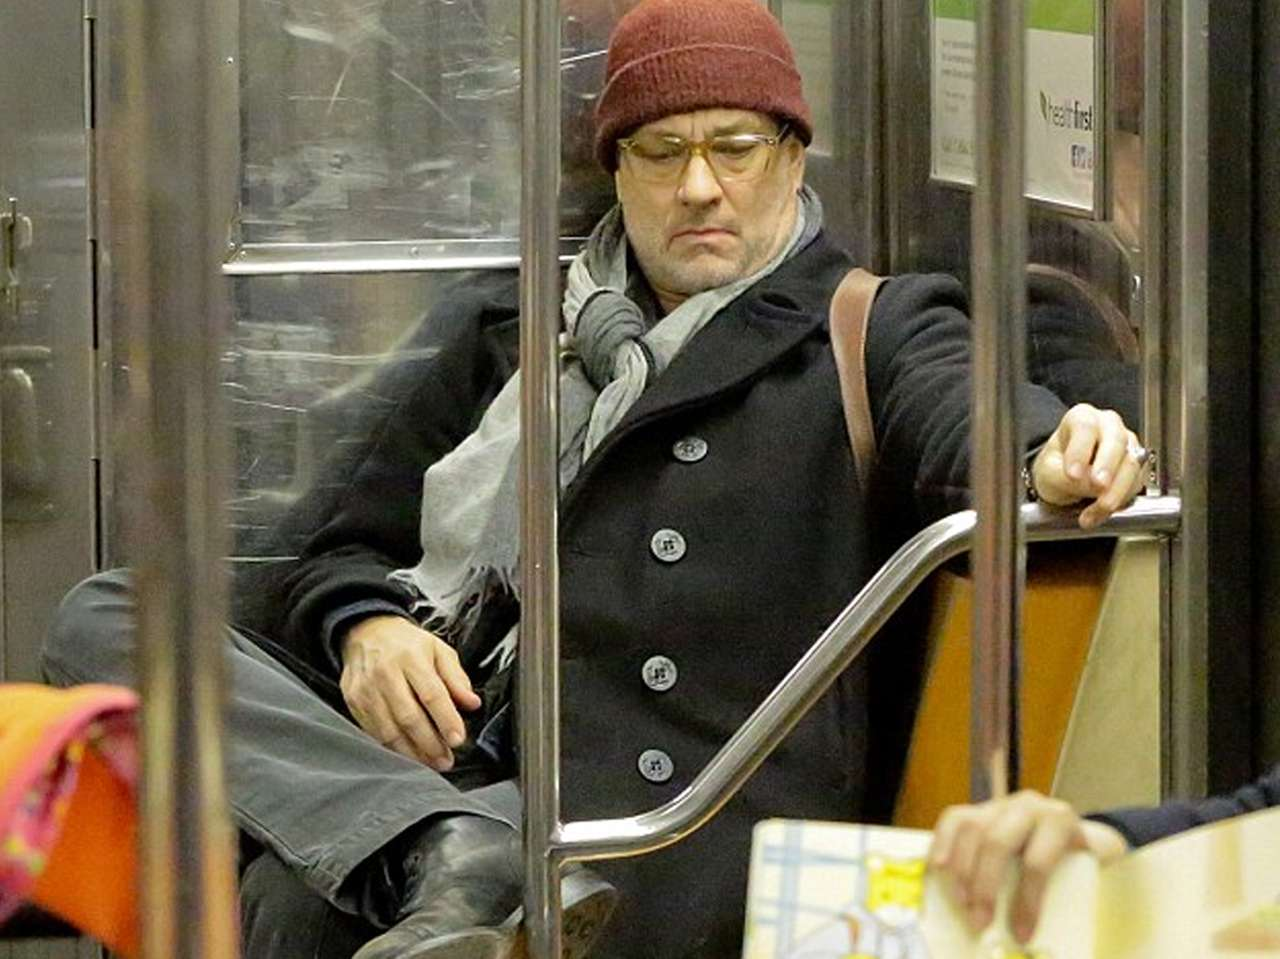 Tom Hanks hizo una parada para comprar un café caliente. Foto: Daily Mail